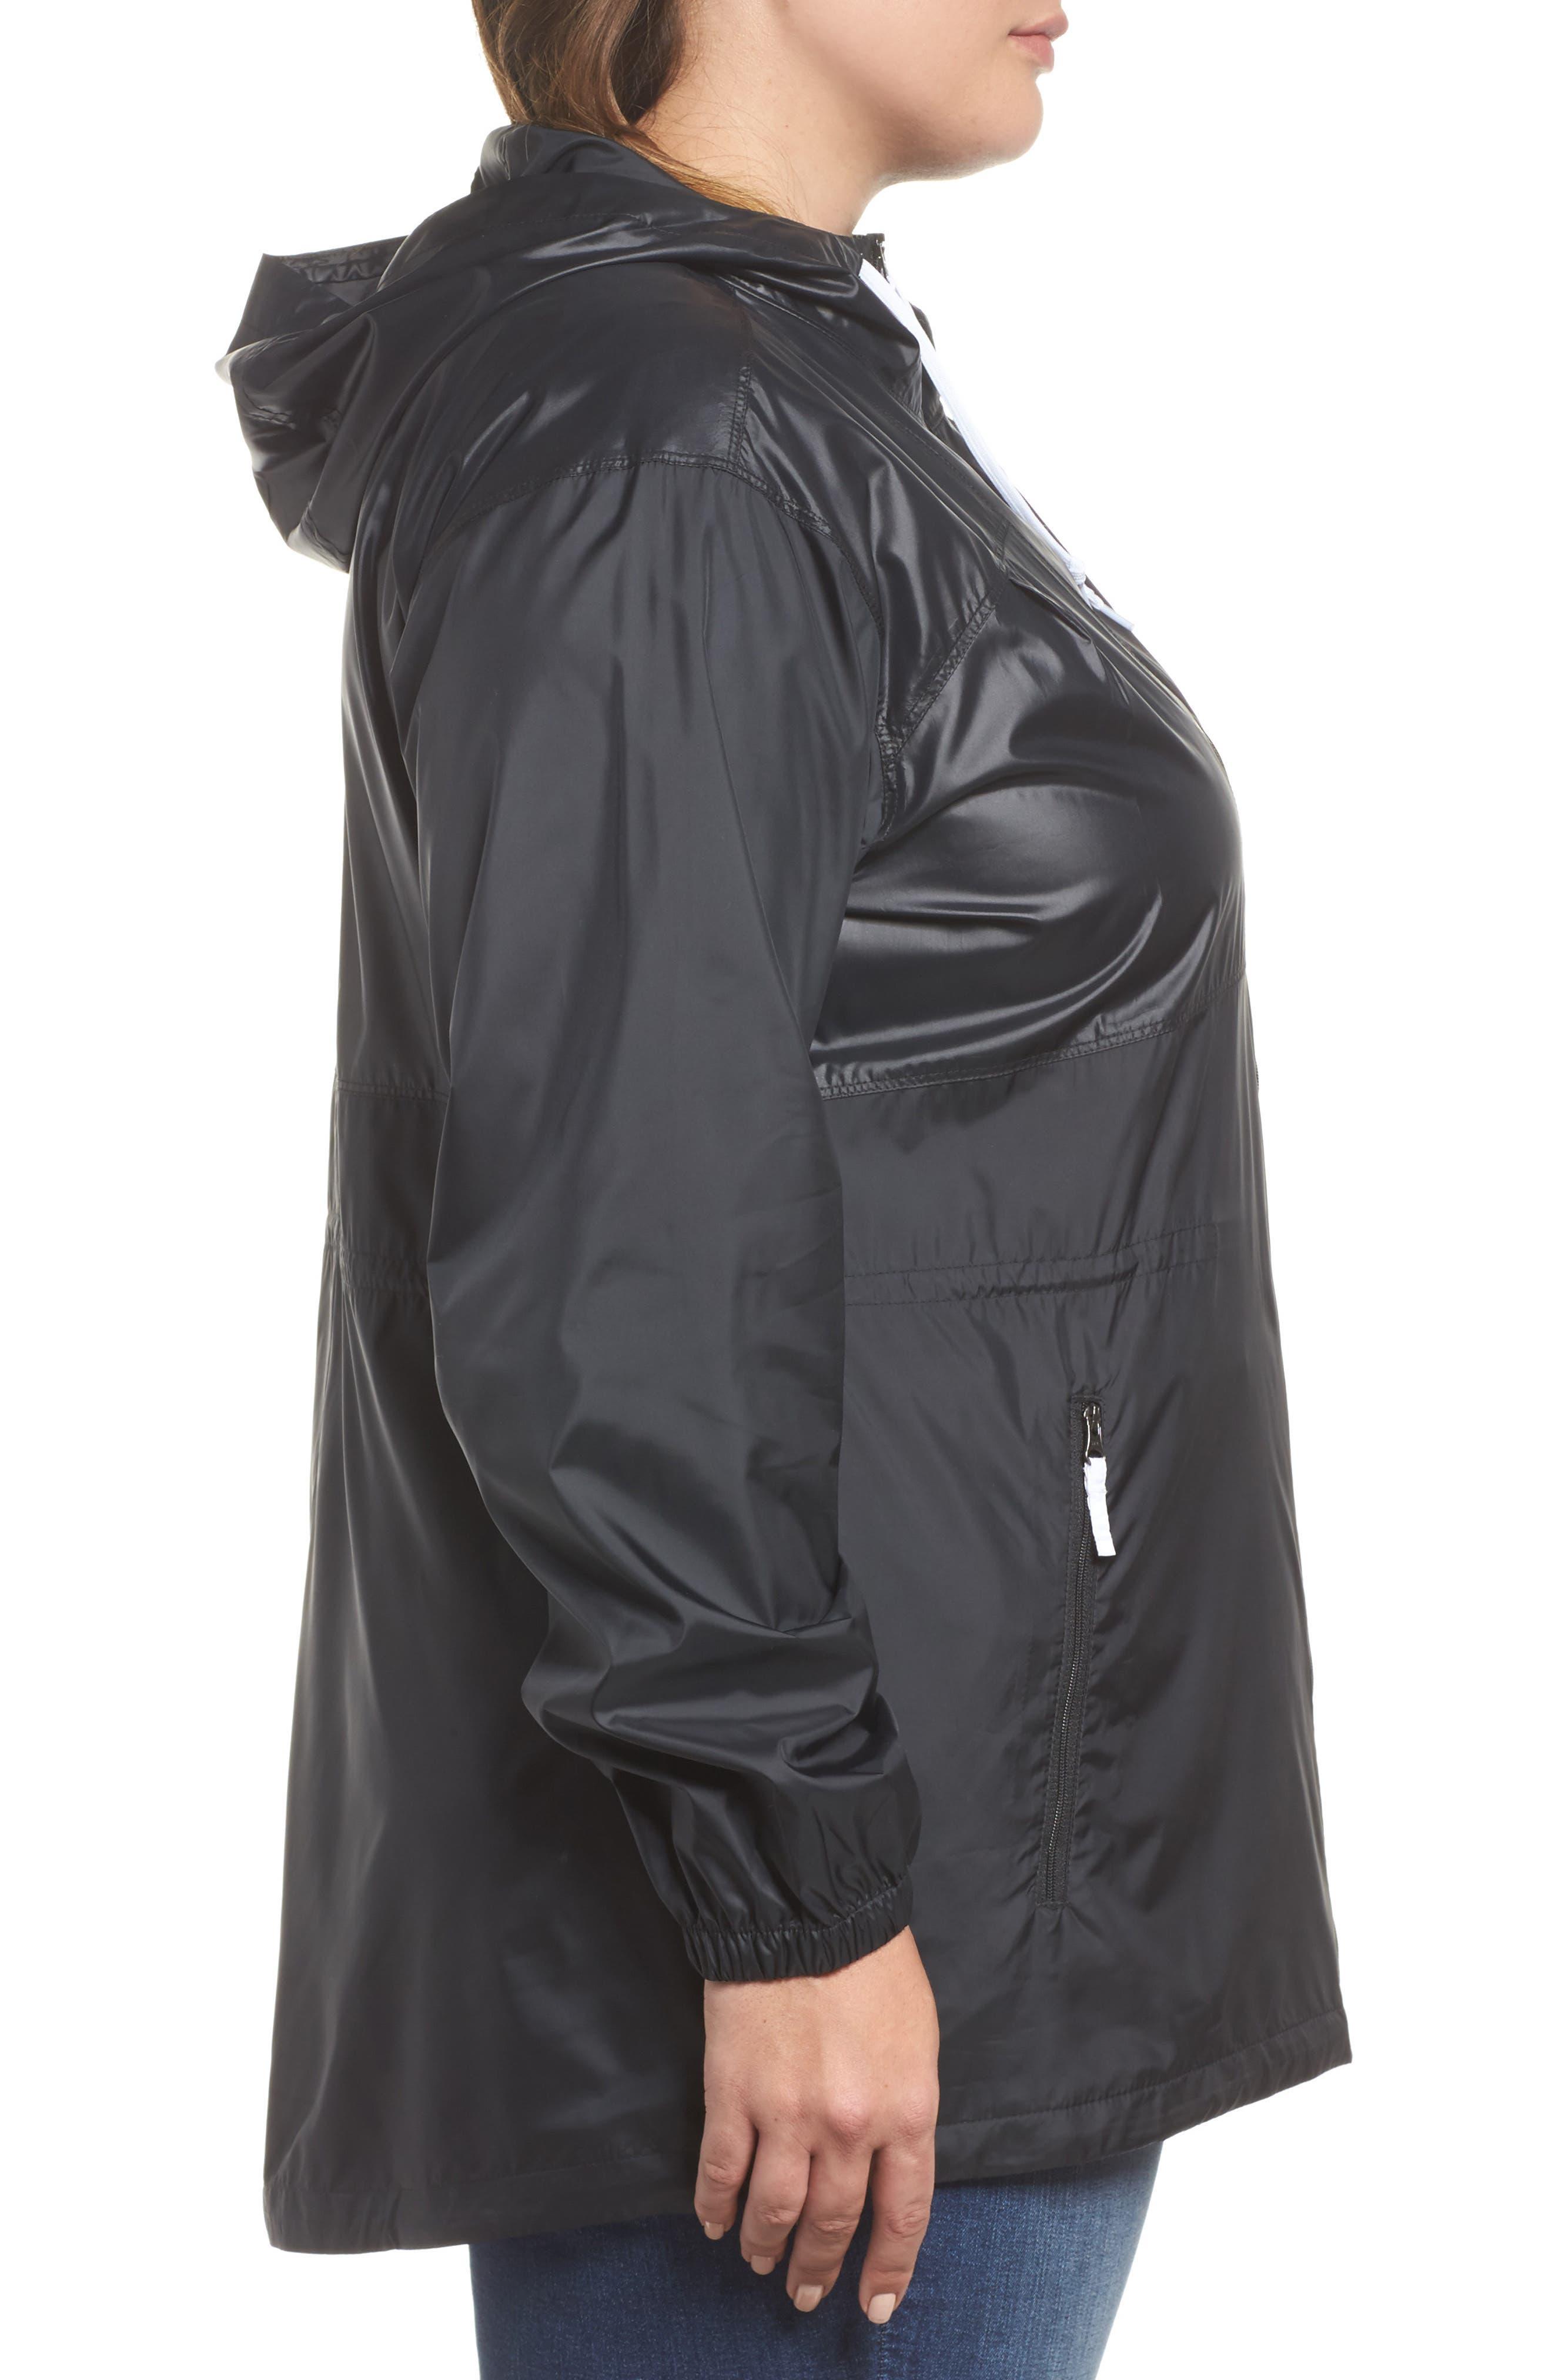 Flashback<sup>™</sup> Water Resistant Hooded Windbreaker,                             Alternate thumbnail 3, color,                             Black Shiny/ Matte White